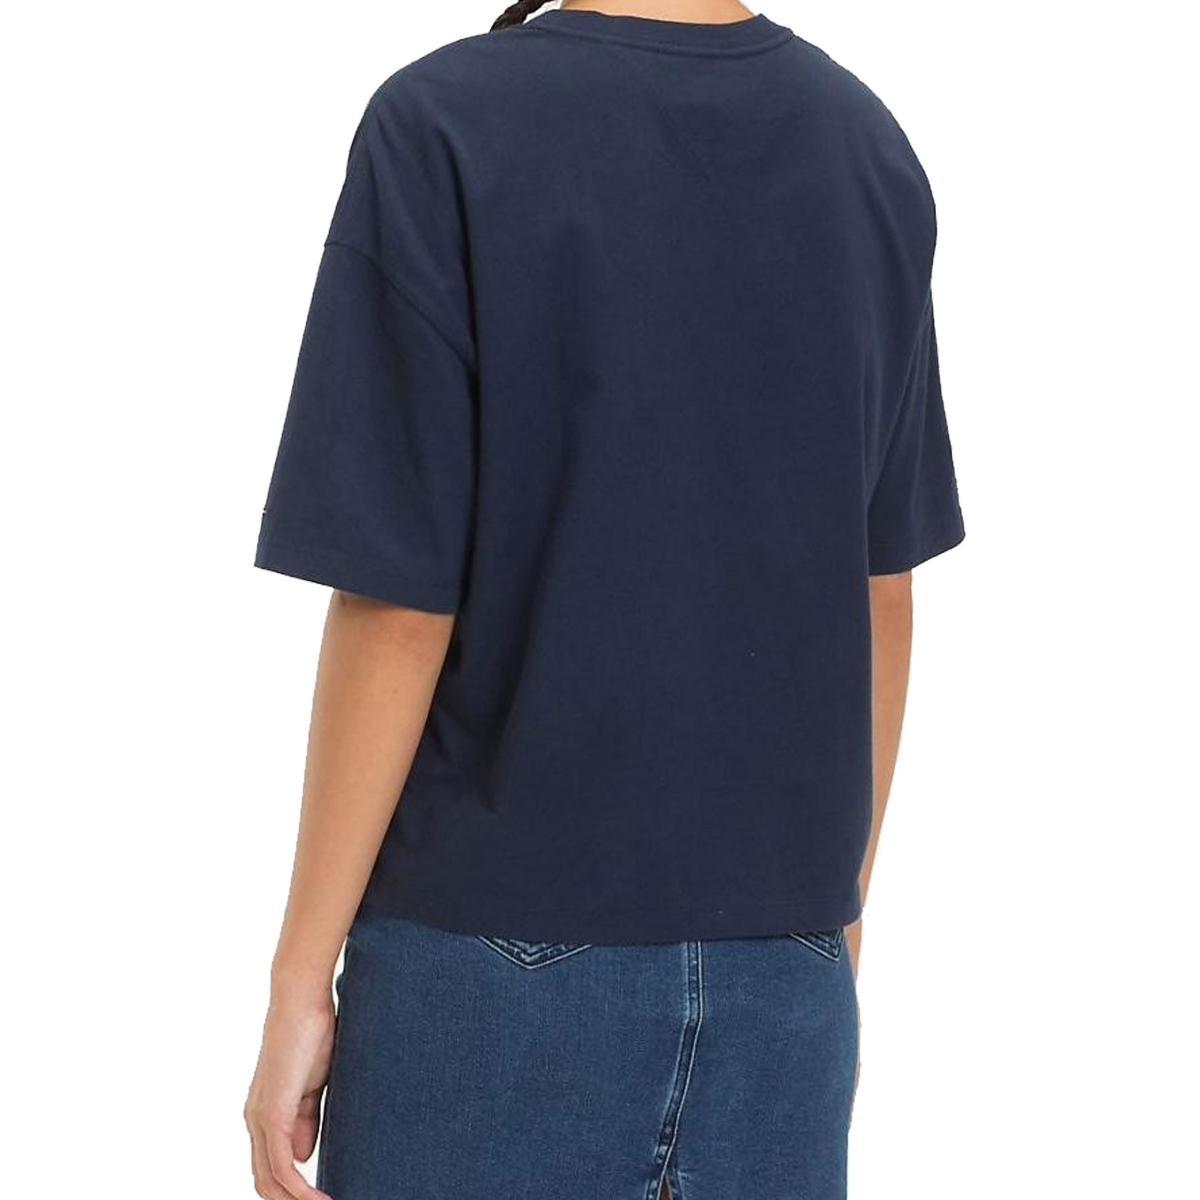 T-shirt Tommy Jeans squadrata con stampa da donna rif. DW0DW05711